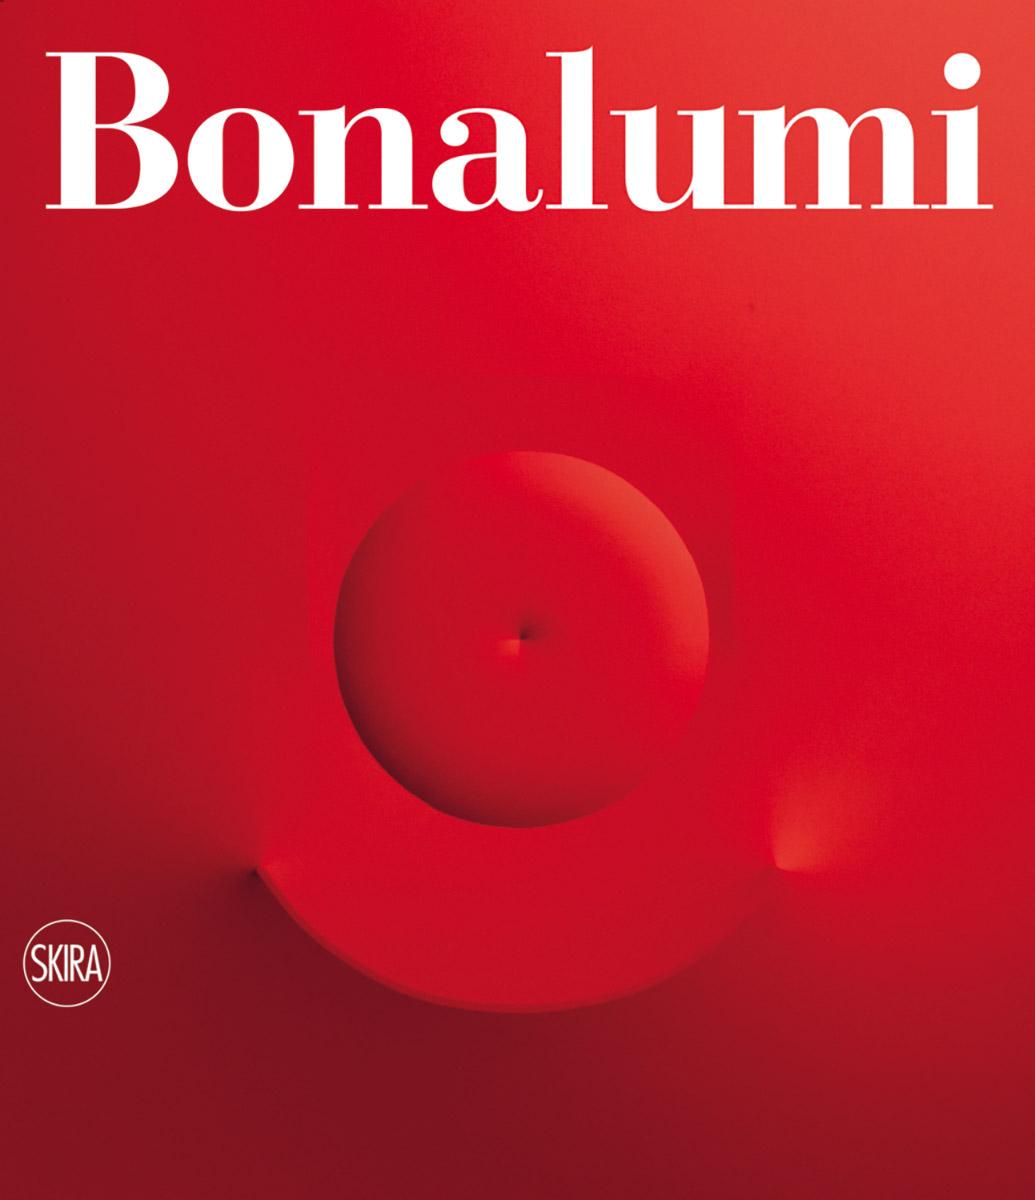 Agostino Bonalumi. Catalogo ragionato (Skira)